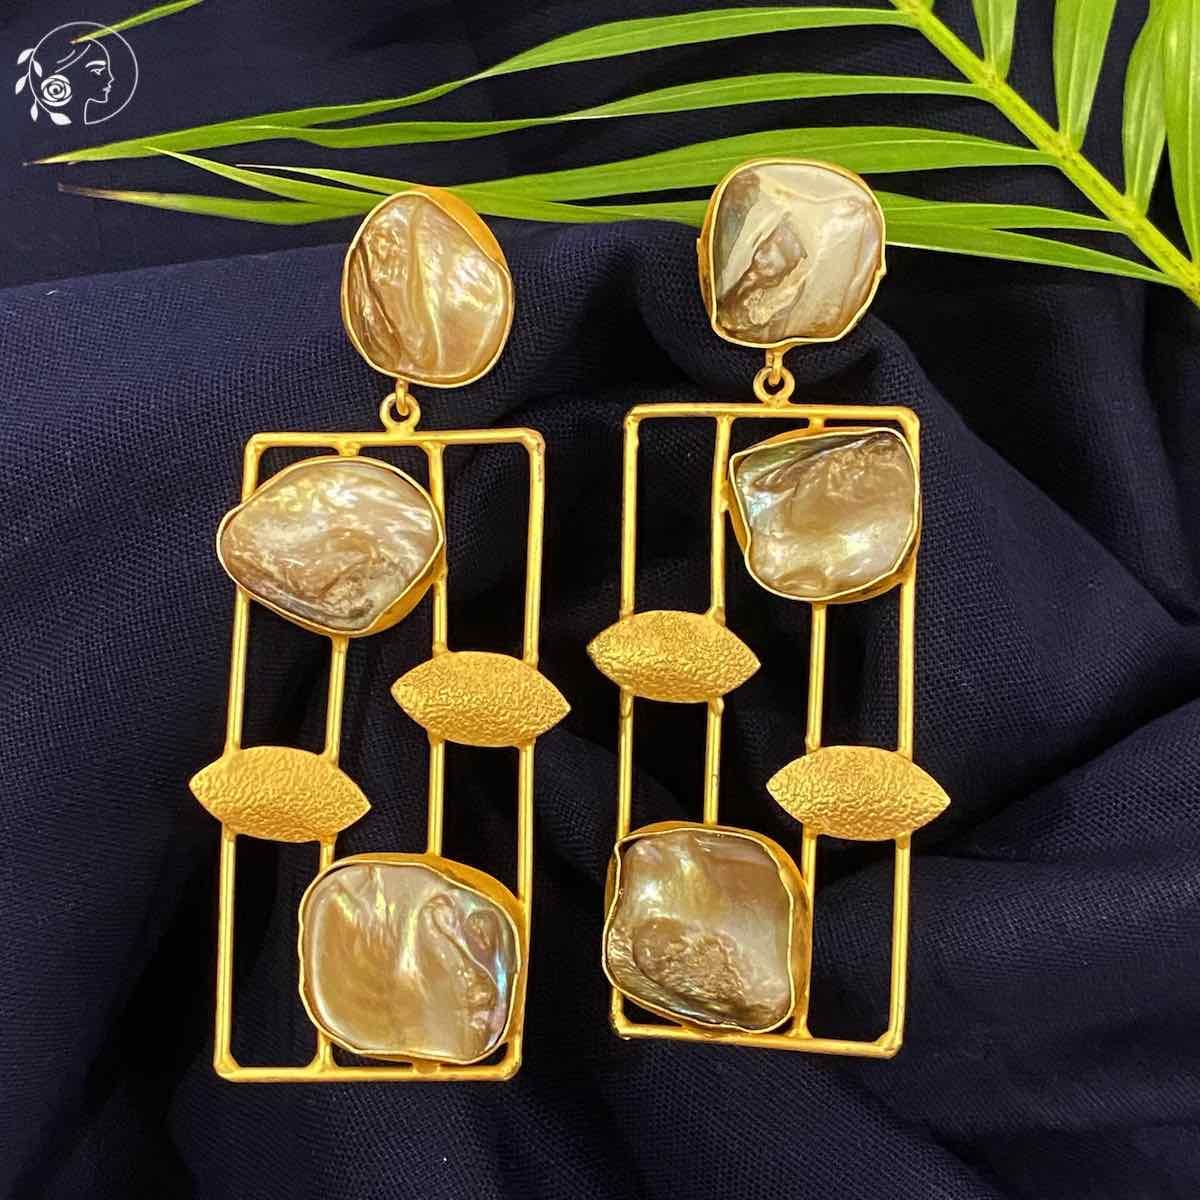 Swabhimann Jewellery   Swabhimann Yama Mother of Pearl Earrings with Gold Leaf